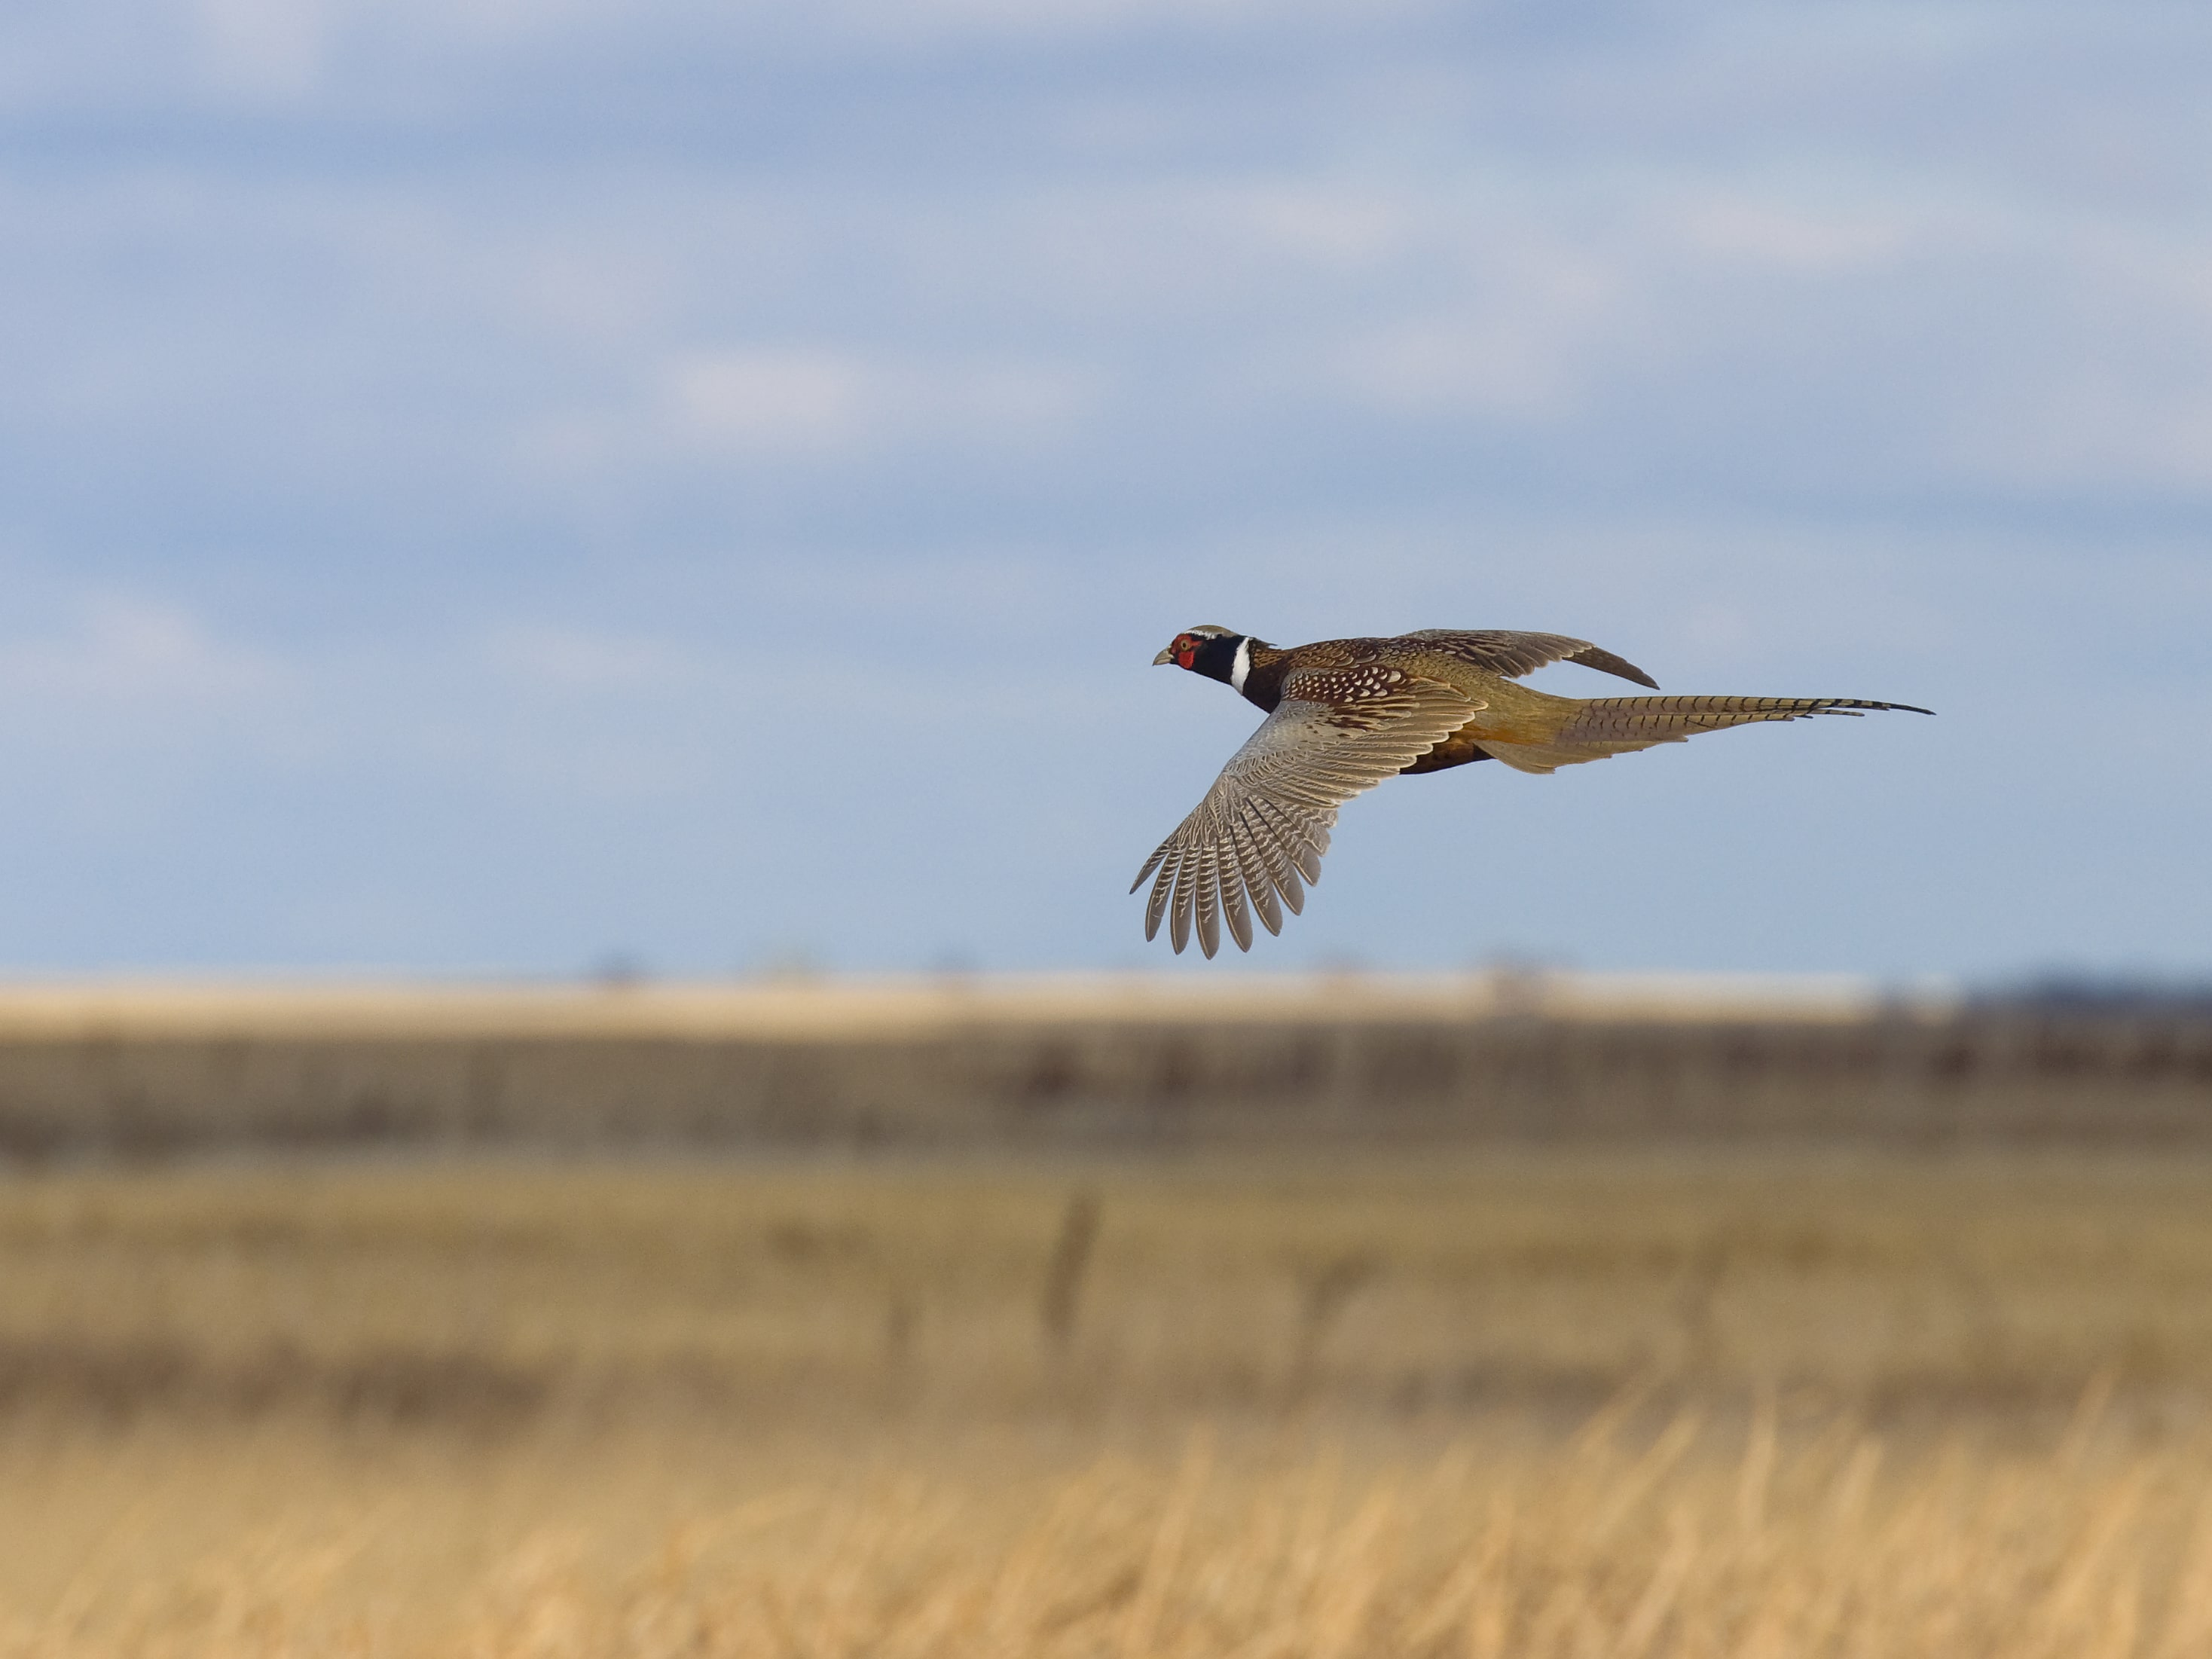 Ареал, места обитания птицы фазан